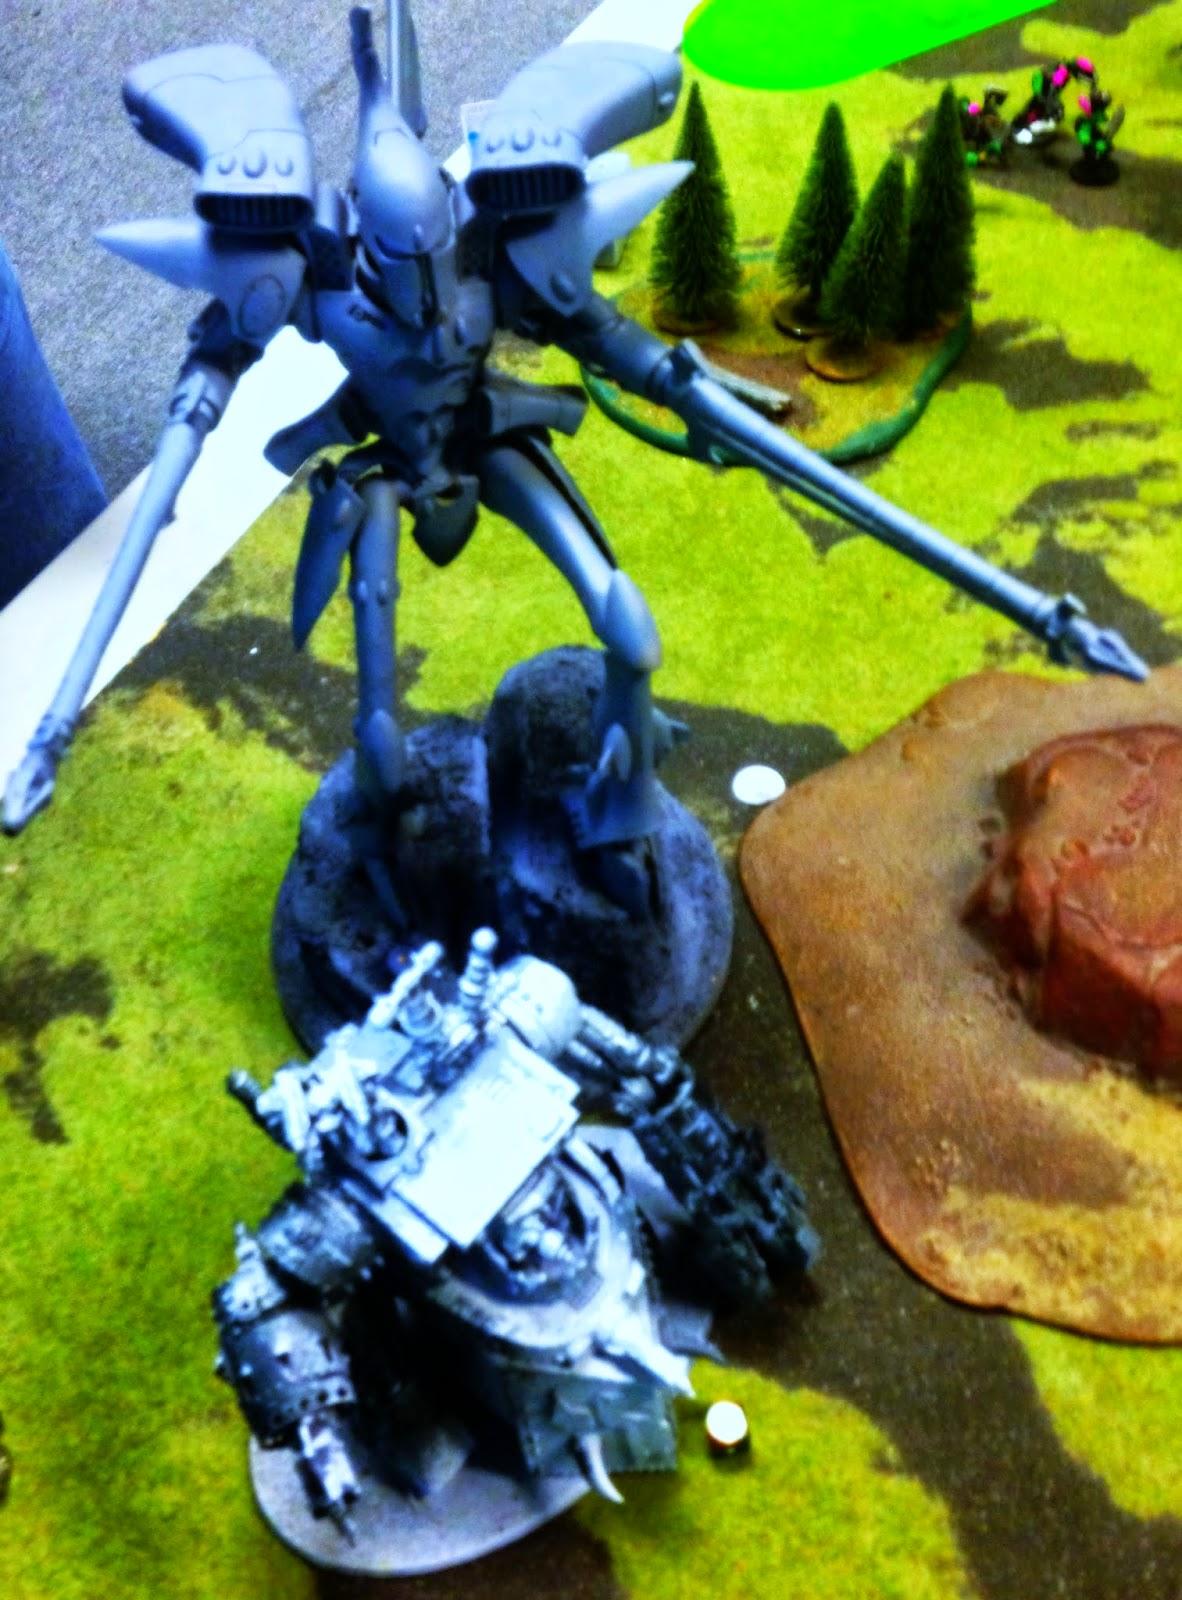 Morkanaut fighting Eldar, Warhammer 40K, Battle Gaming One